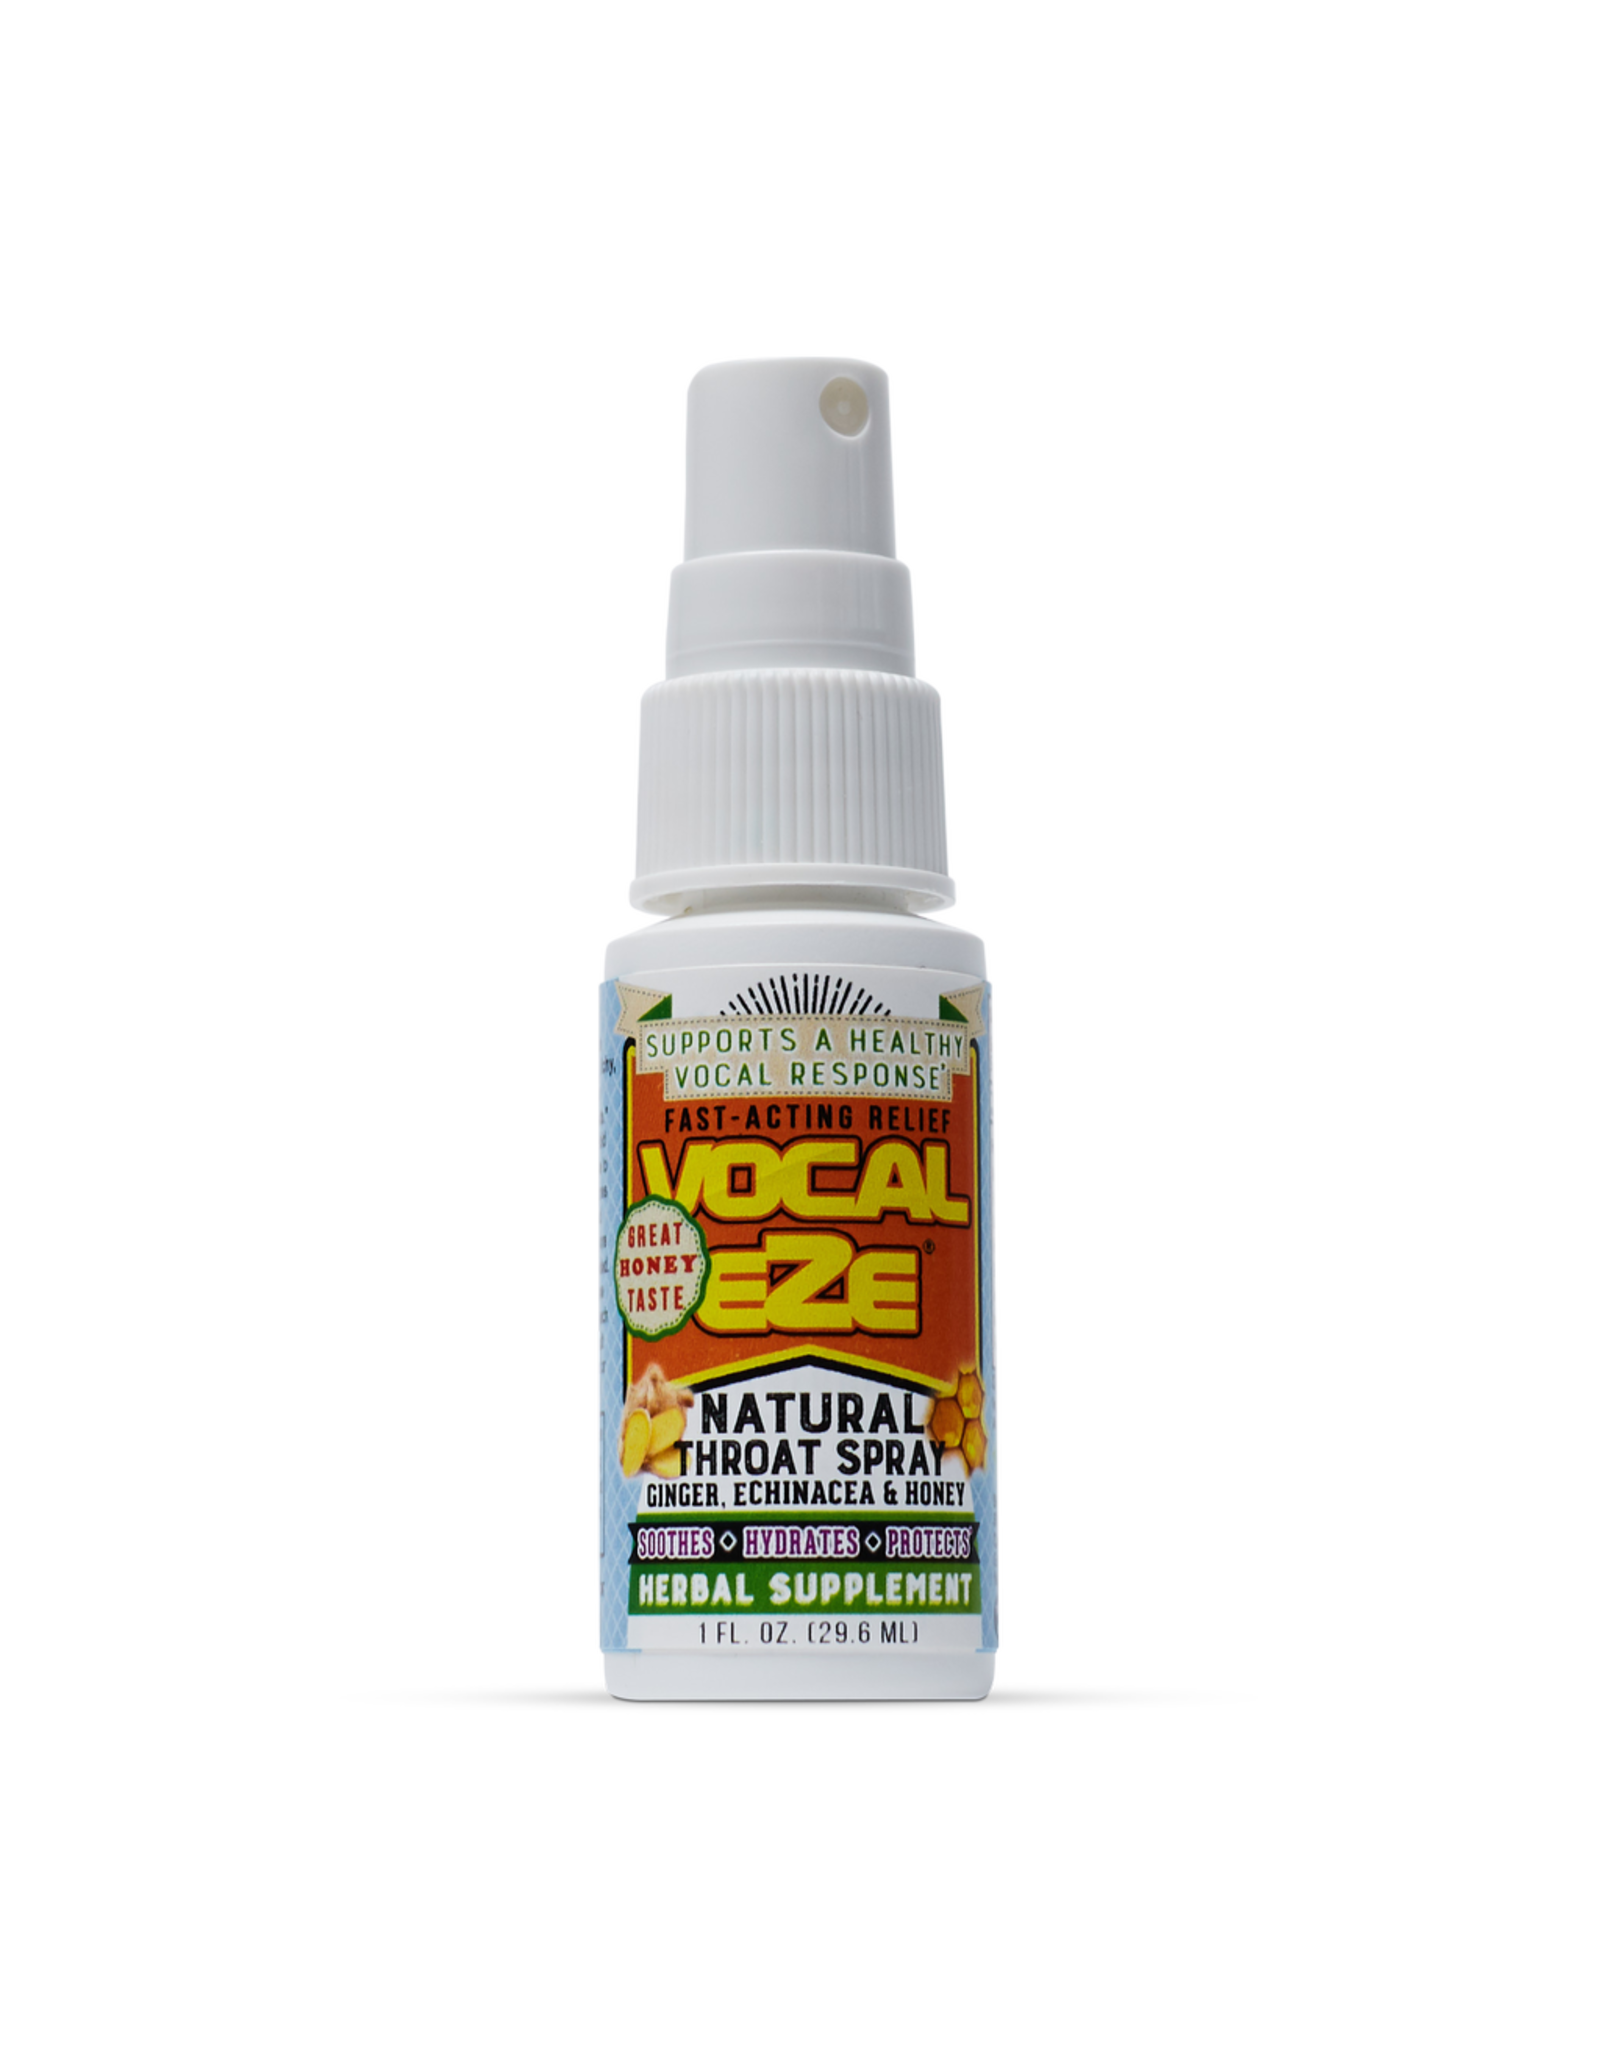 Green Peak Wellness Vocal Eze Throat Spray